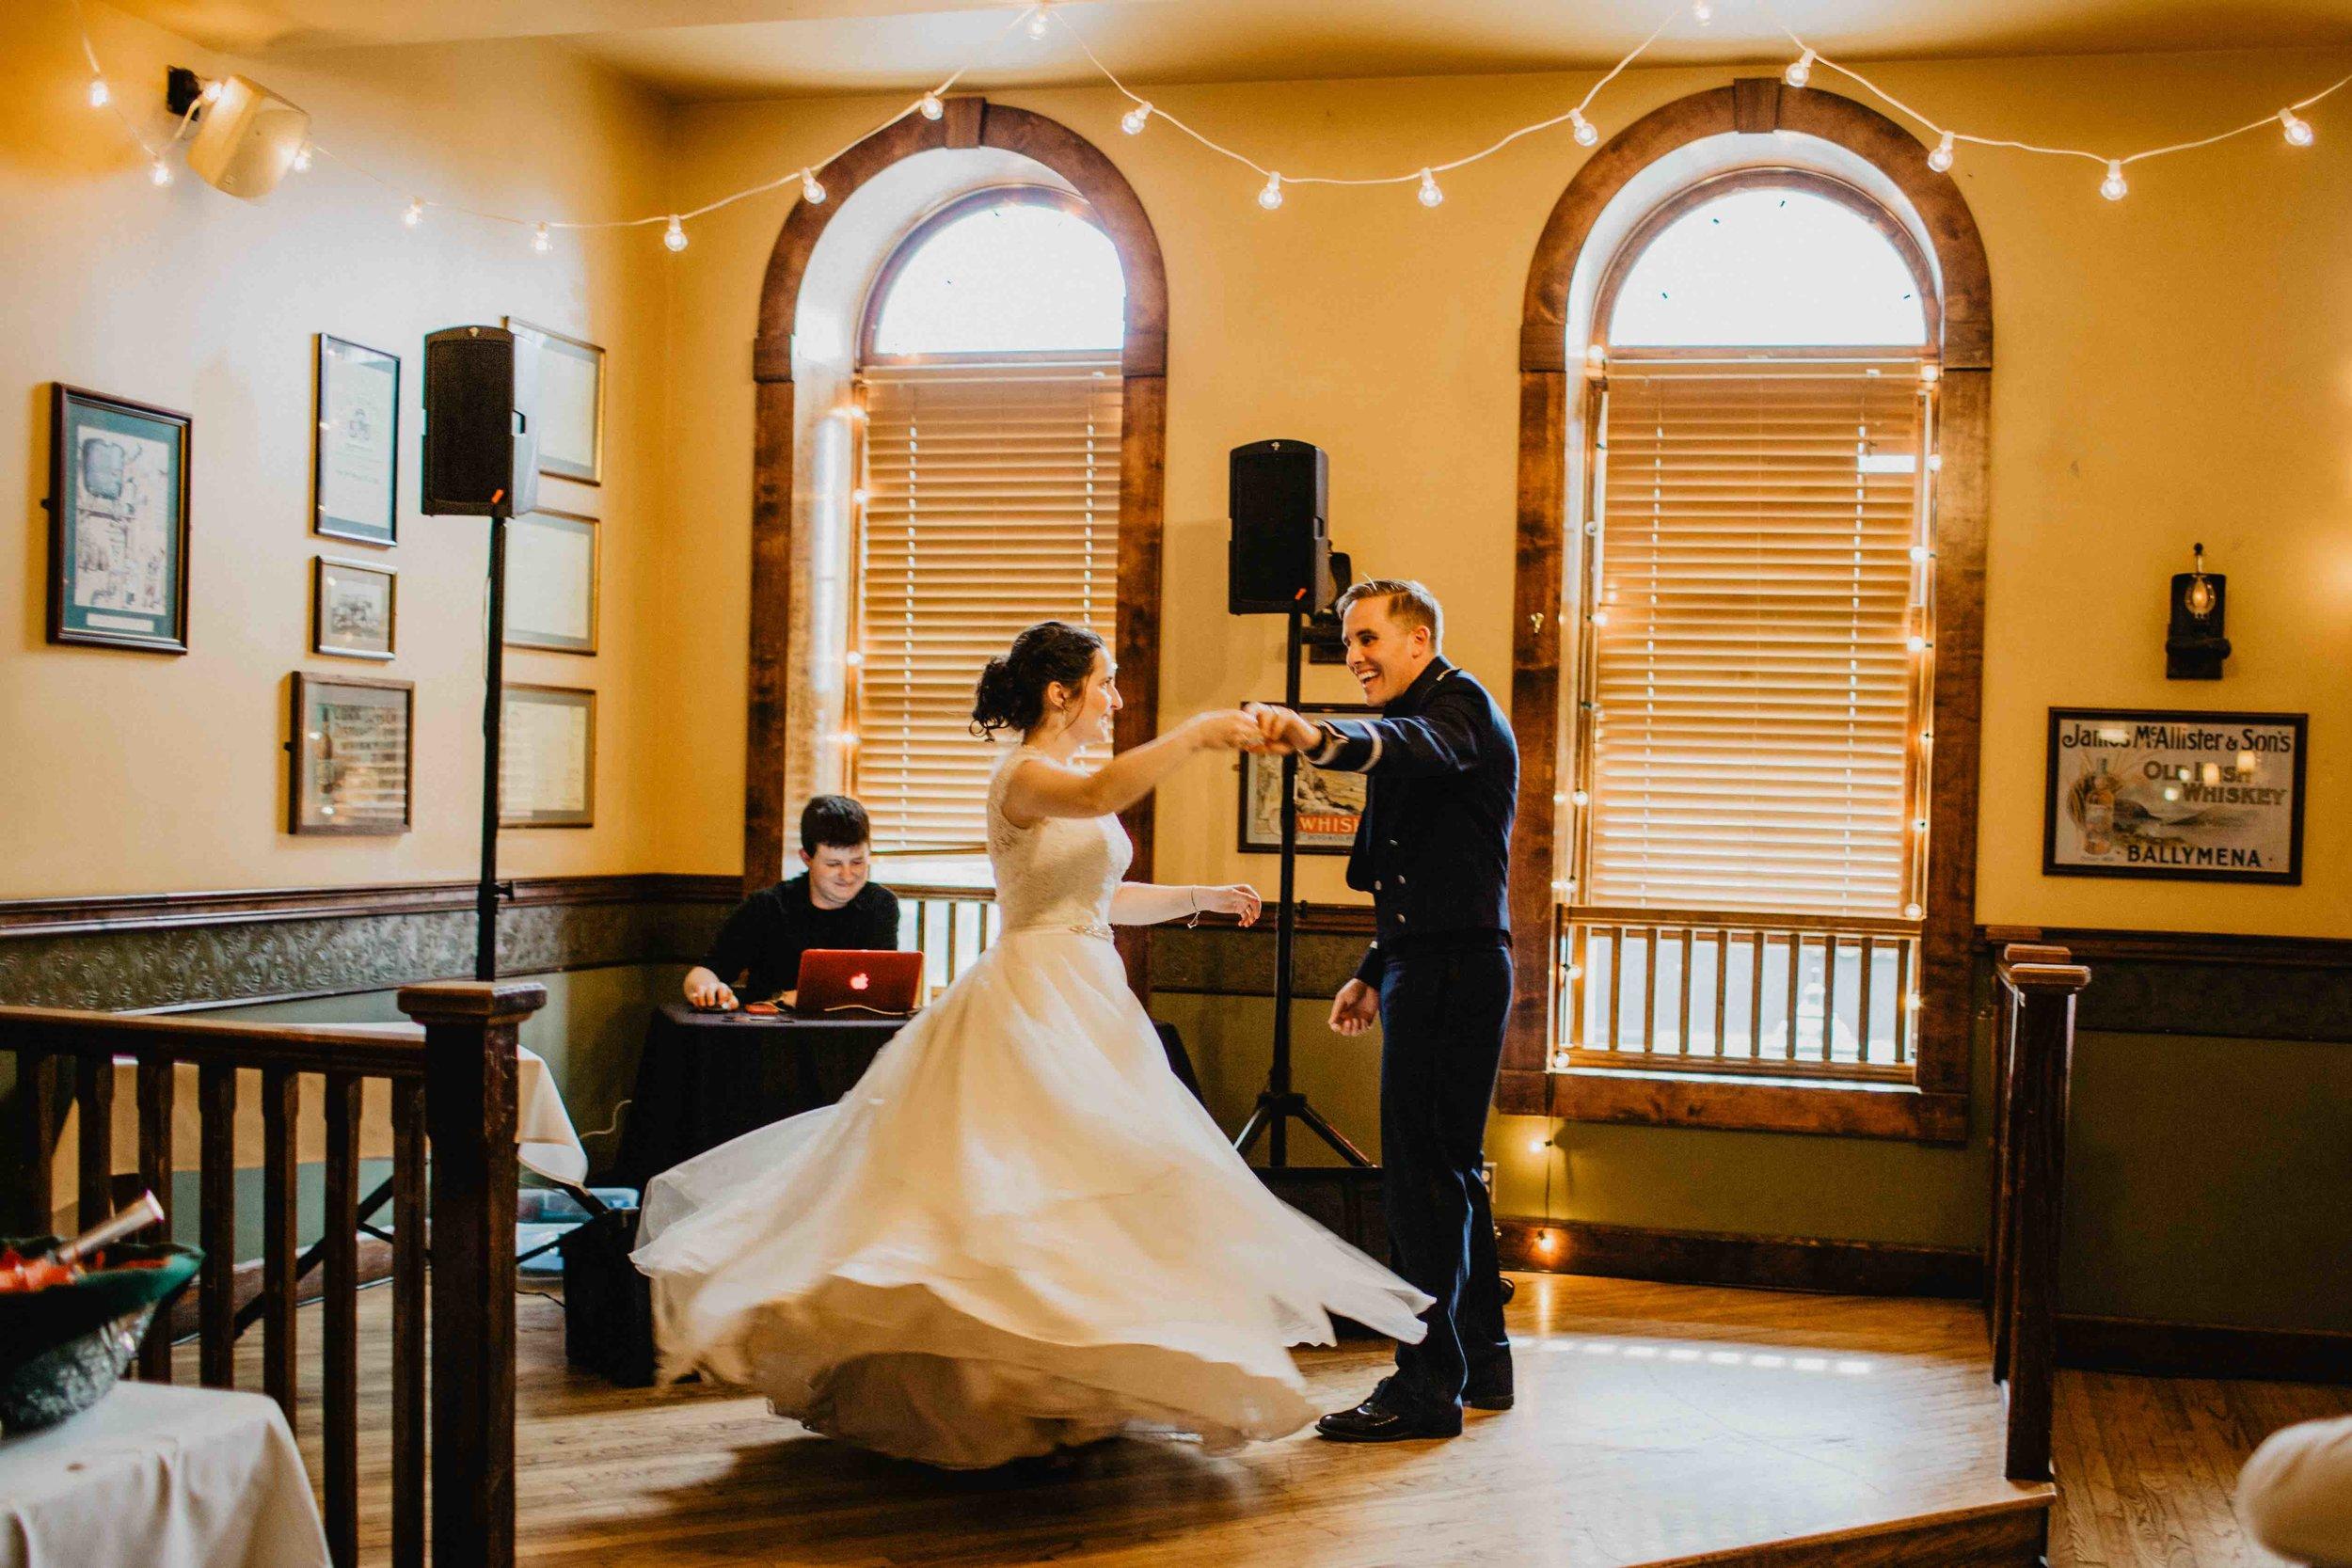 607A6294-colorado-wedding-photographer-denver-springs-vail--colorado-wedding-photographer-denver-springs-vail-.jpeg